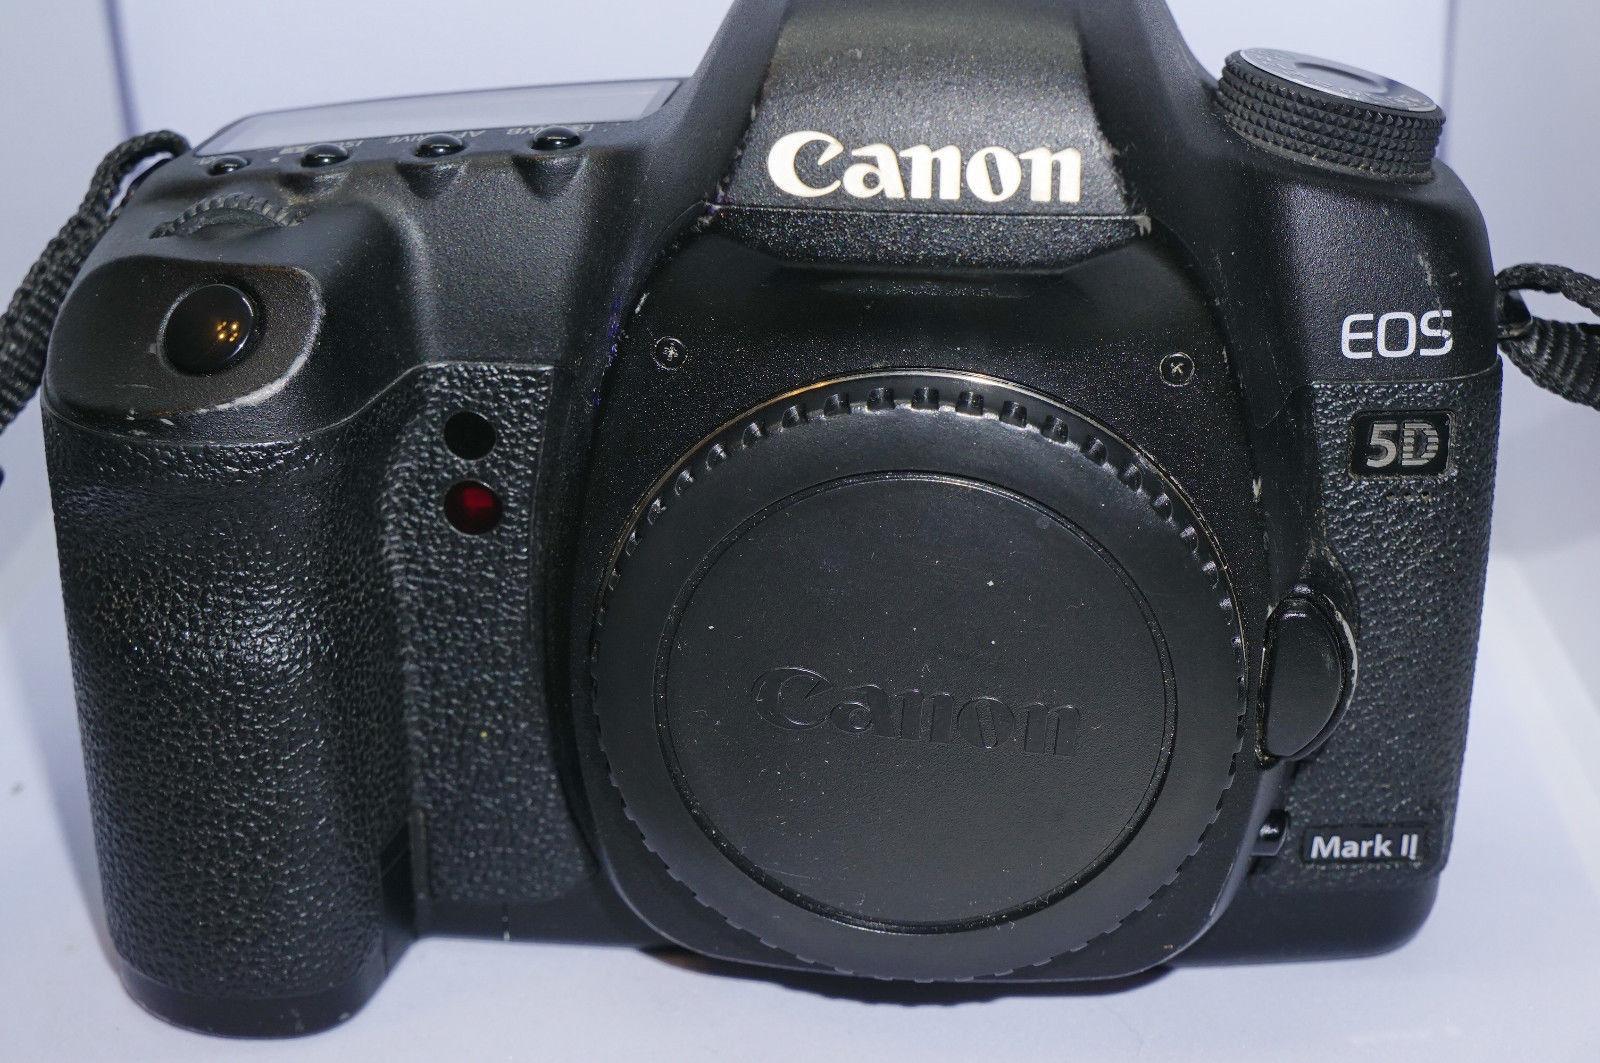 Canon EOS 5D Mark II 21,1 MP Digitalkamera (Nur Gehäuse) ca. 7000 Auslösungen